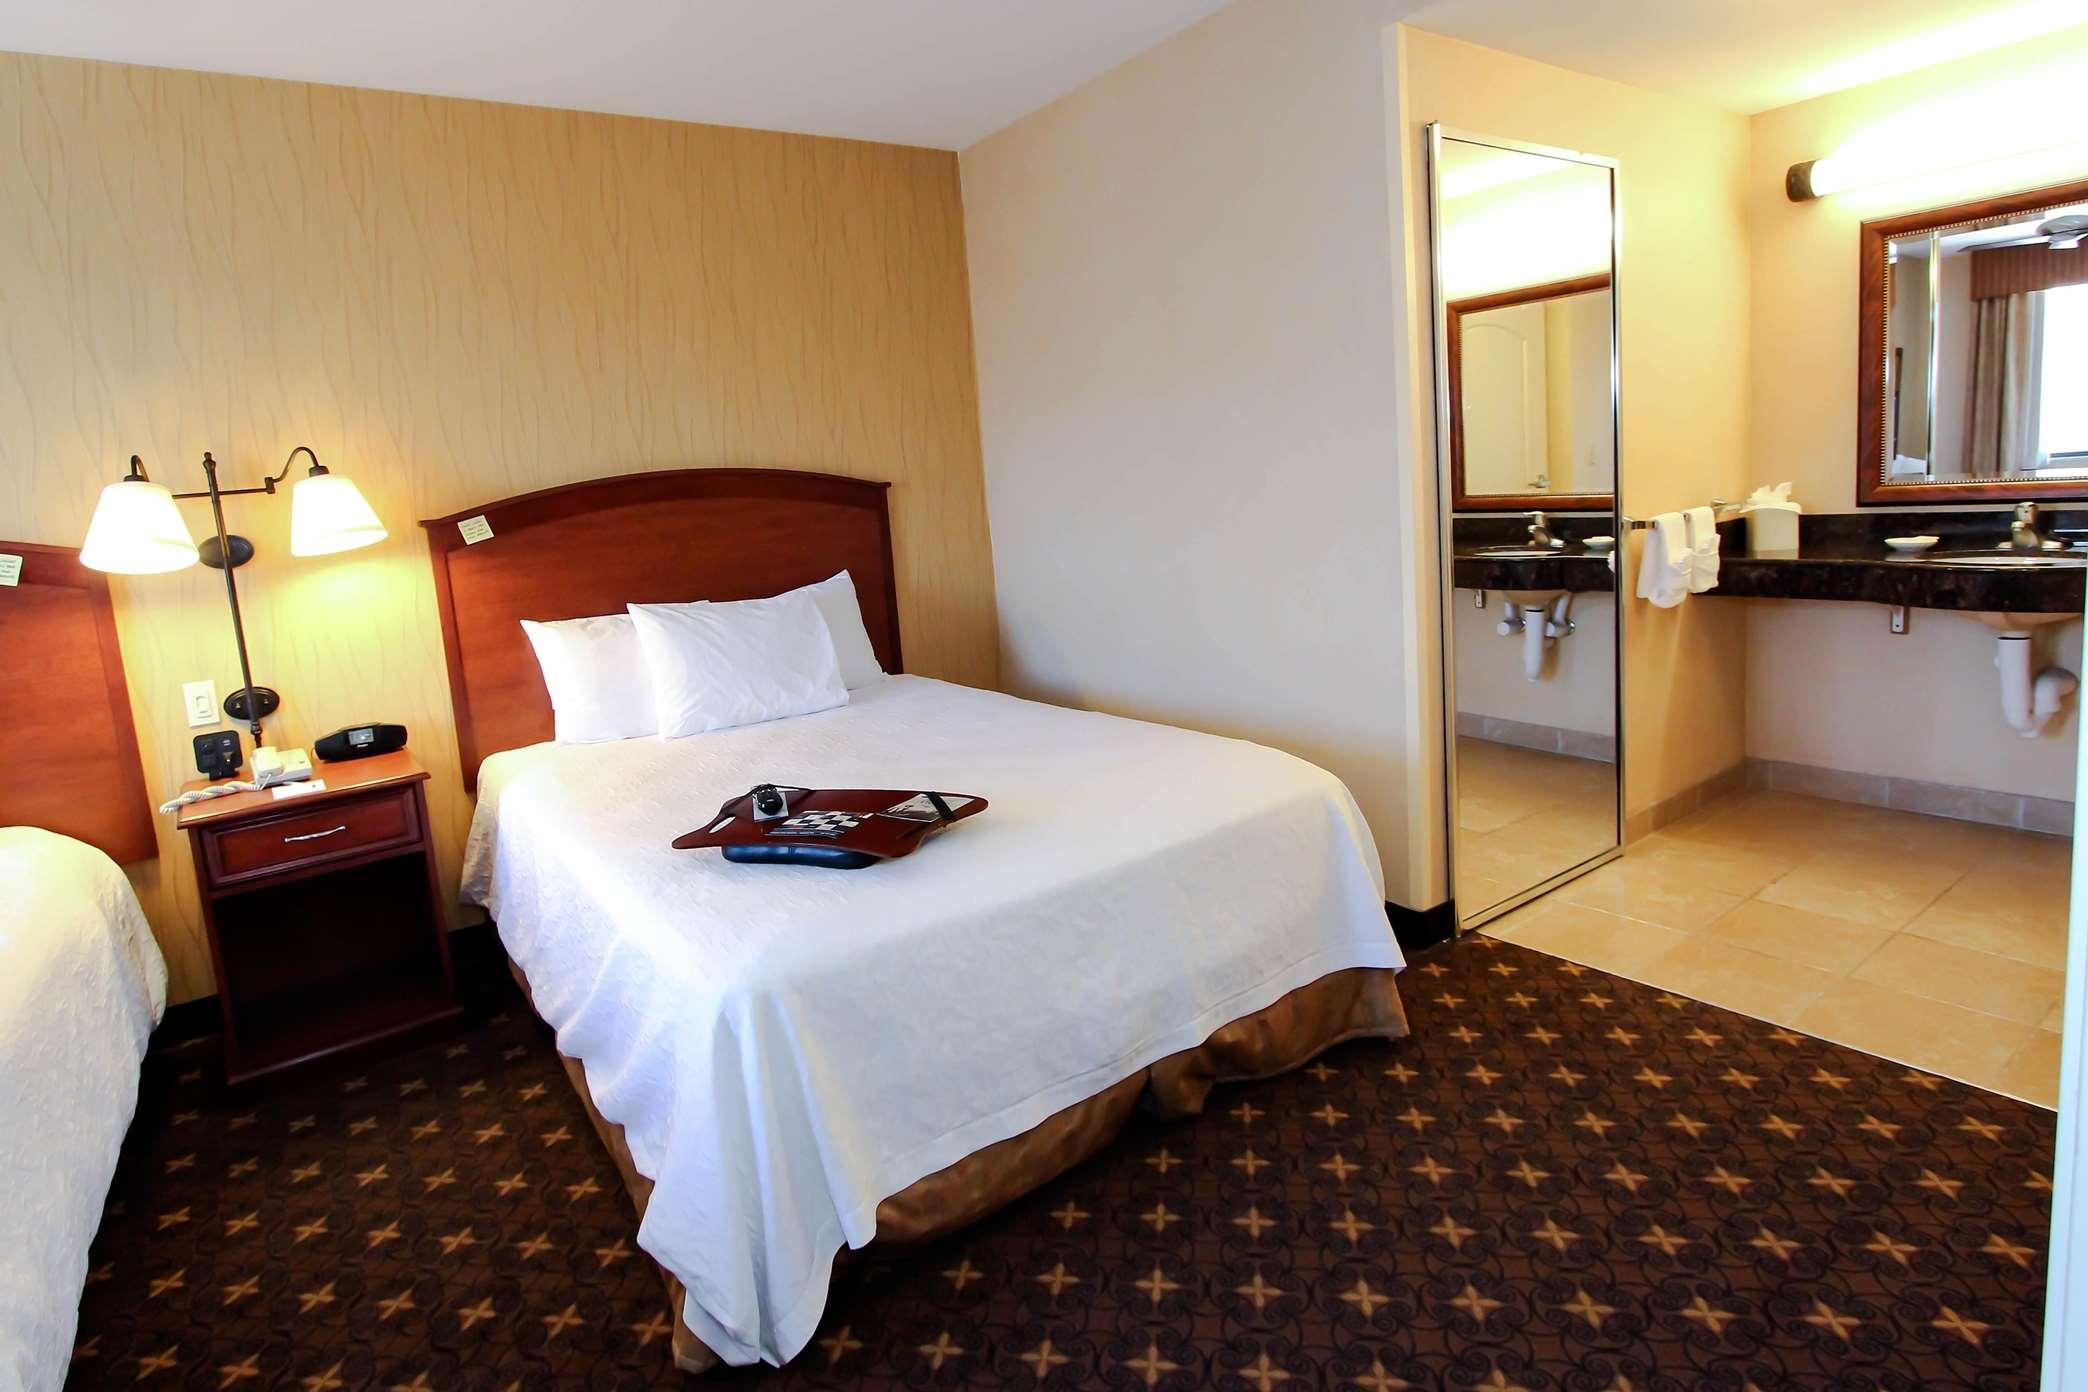 Hampton Inn & Suites Denver-Speer Boulevard image 4